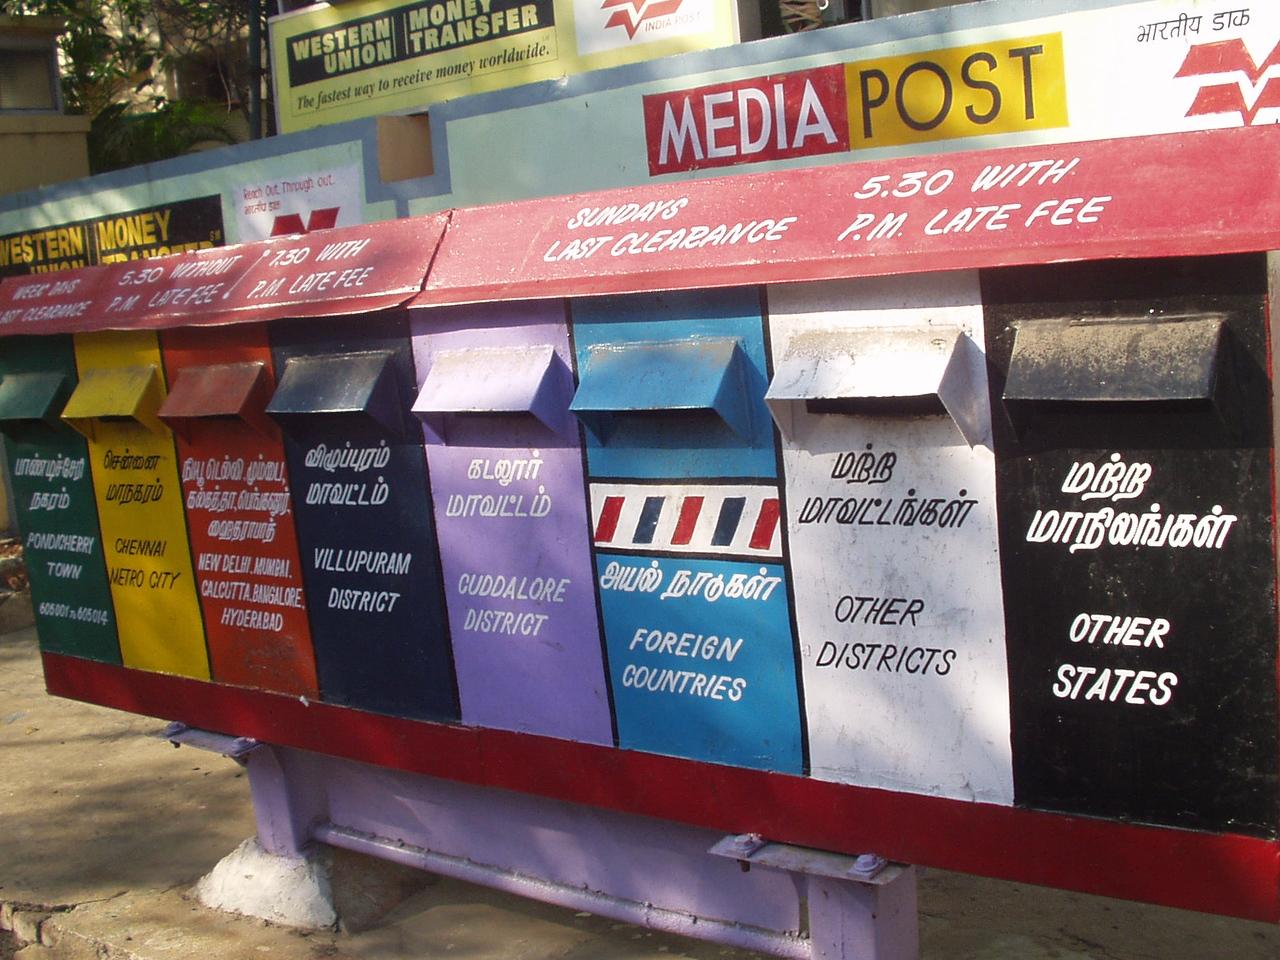 6 February: La poste